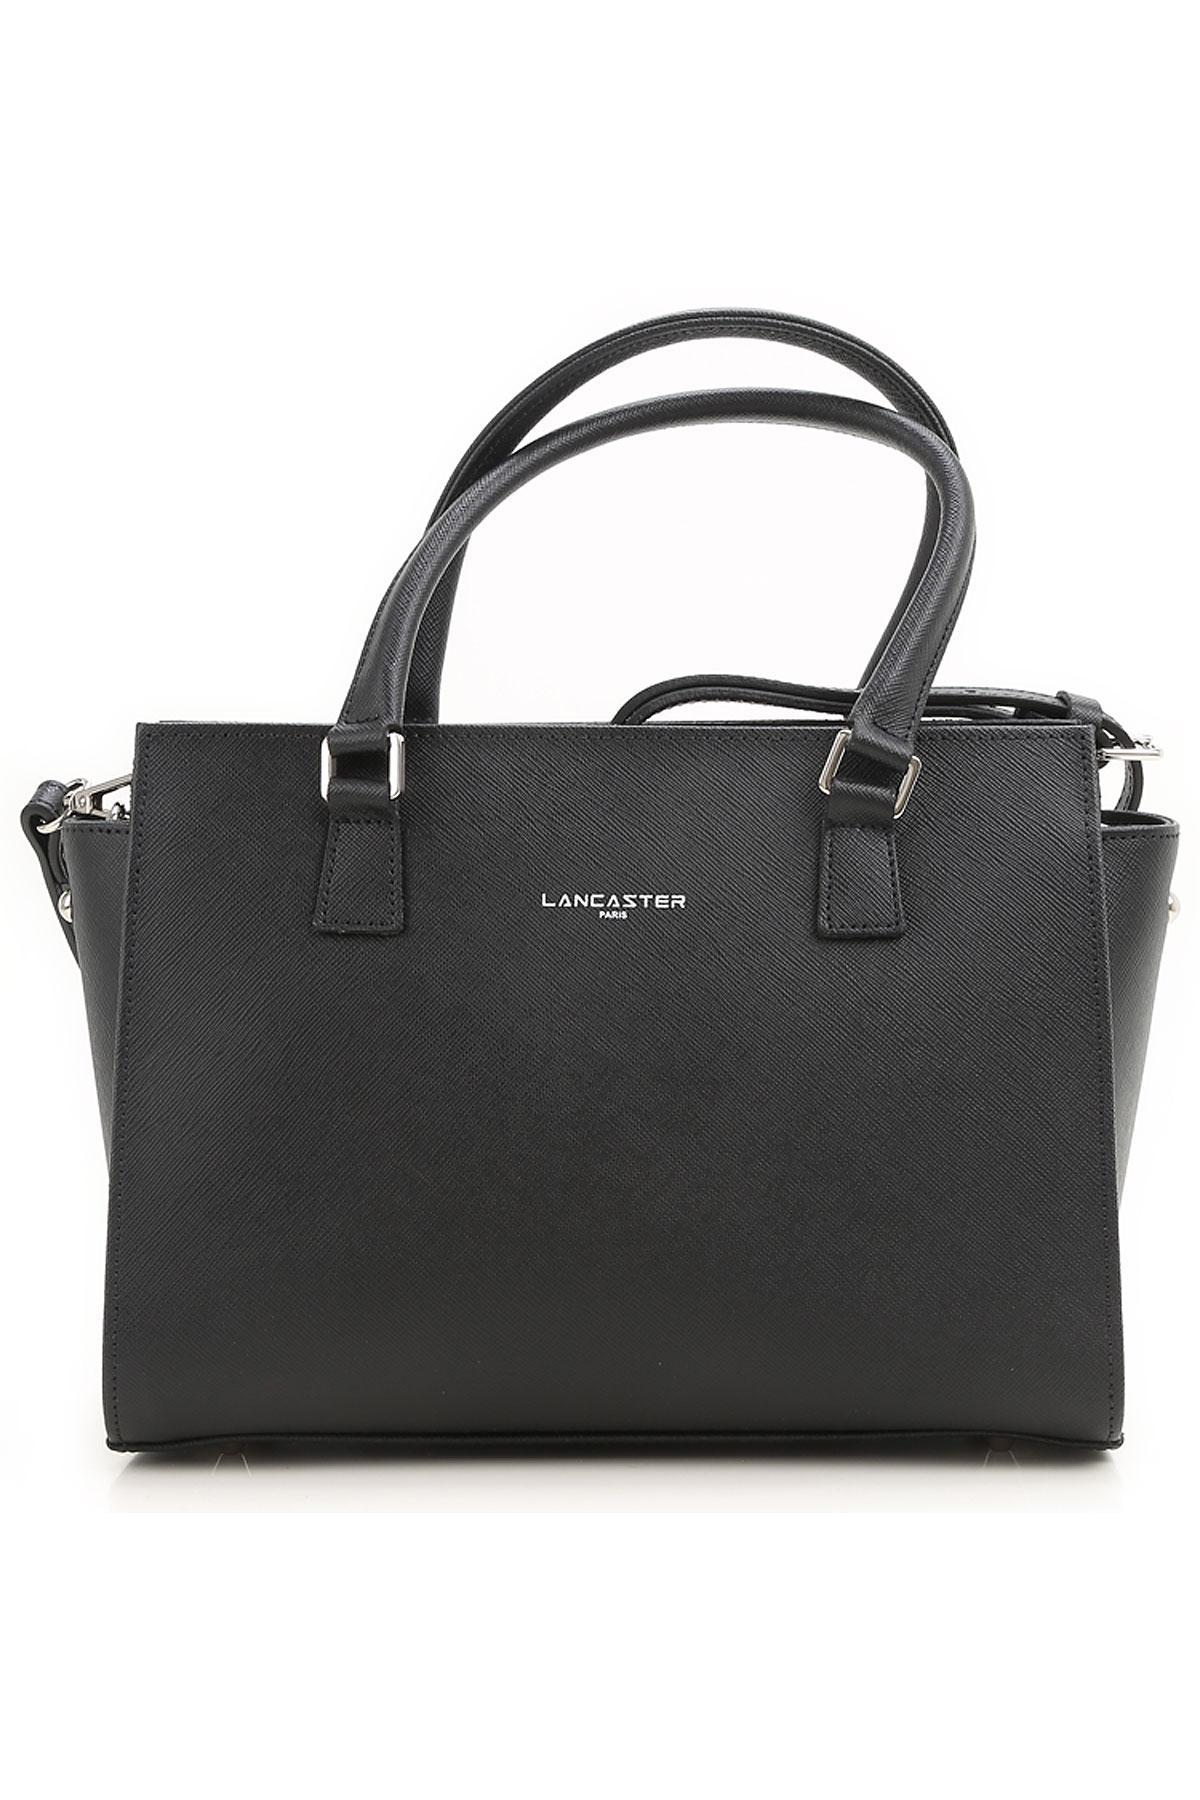 Image of Lancaster Top Handle Handbag, Black, Leather, 2017